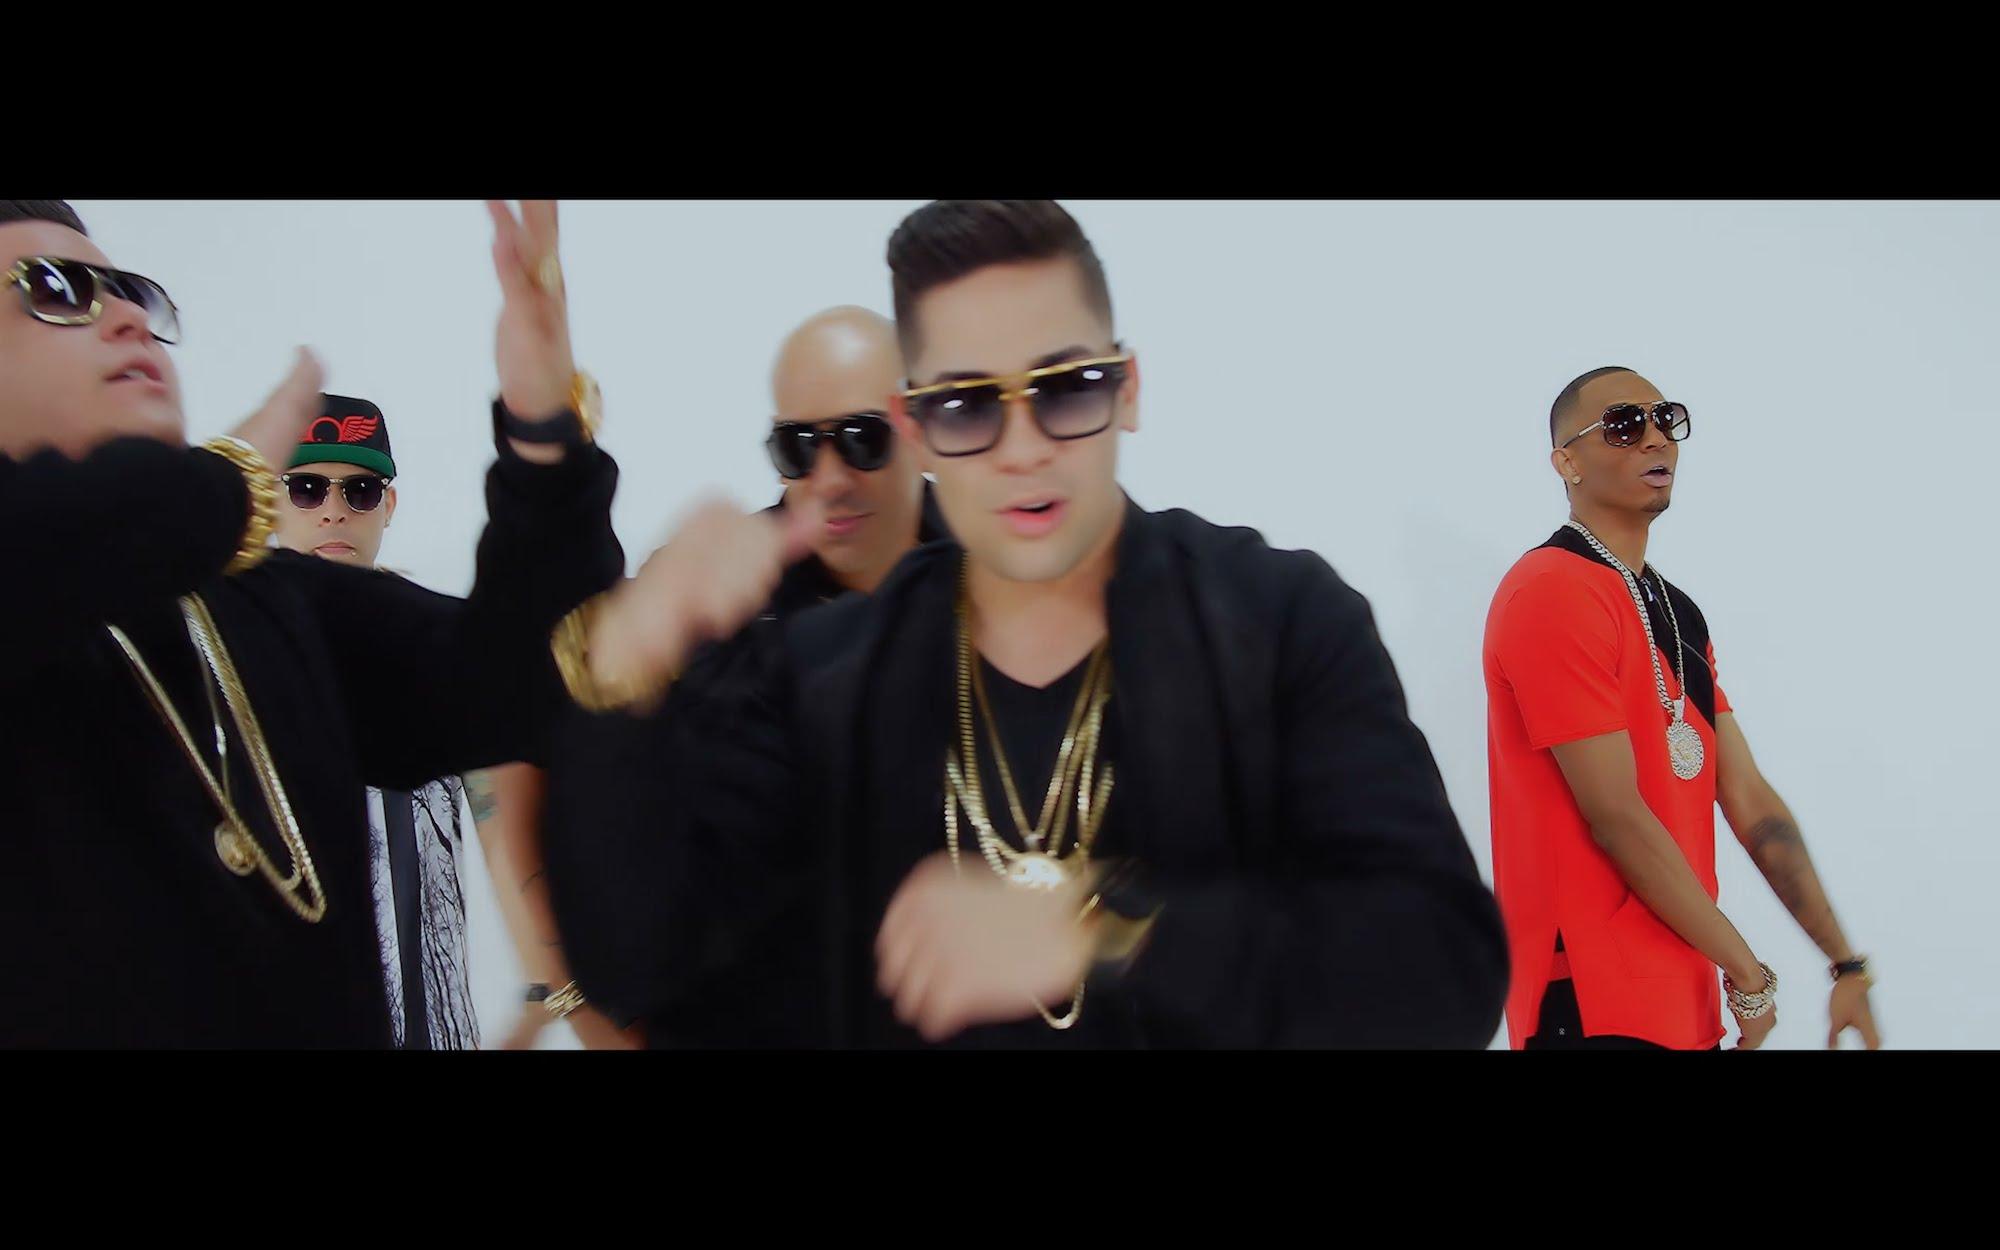 sammy y falsetto ft yomo juanka - Sammy y Falsetto Ft. Yomo, Juanka El Problematik Y Anonimus – Tu Favorito (Official Video)